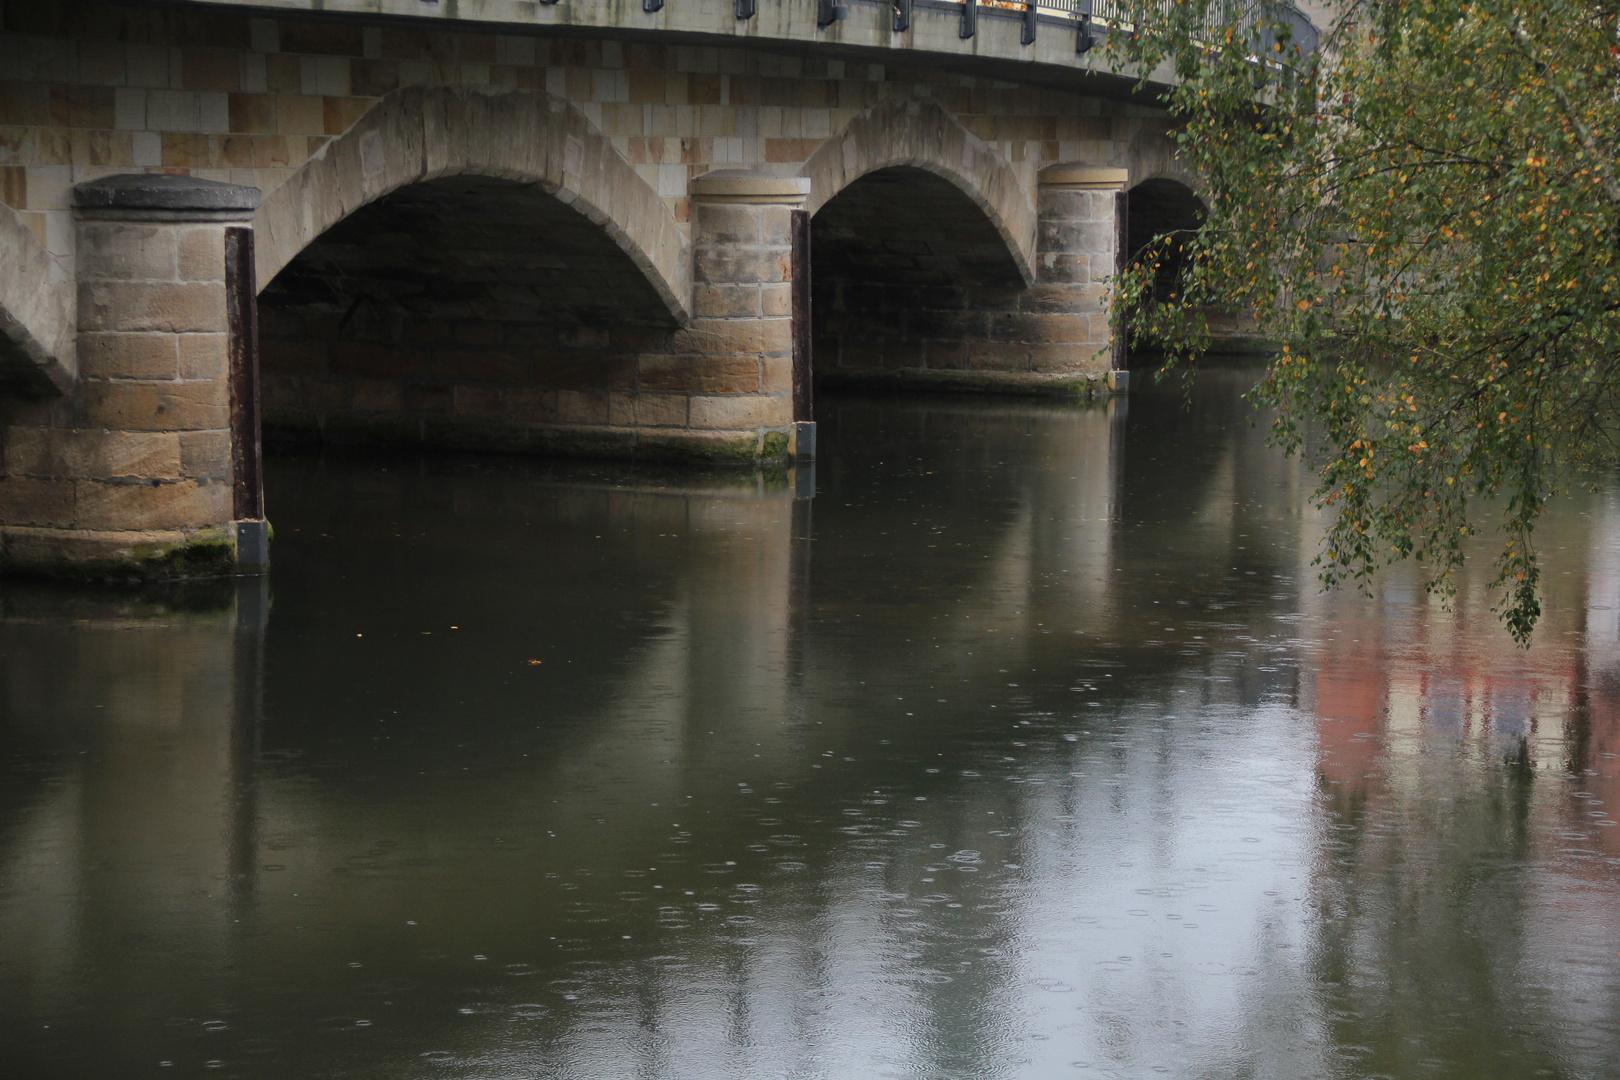 Lauf an der Pegnitz, Brücke